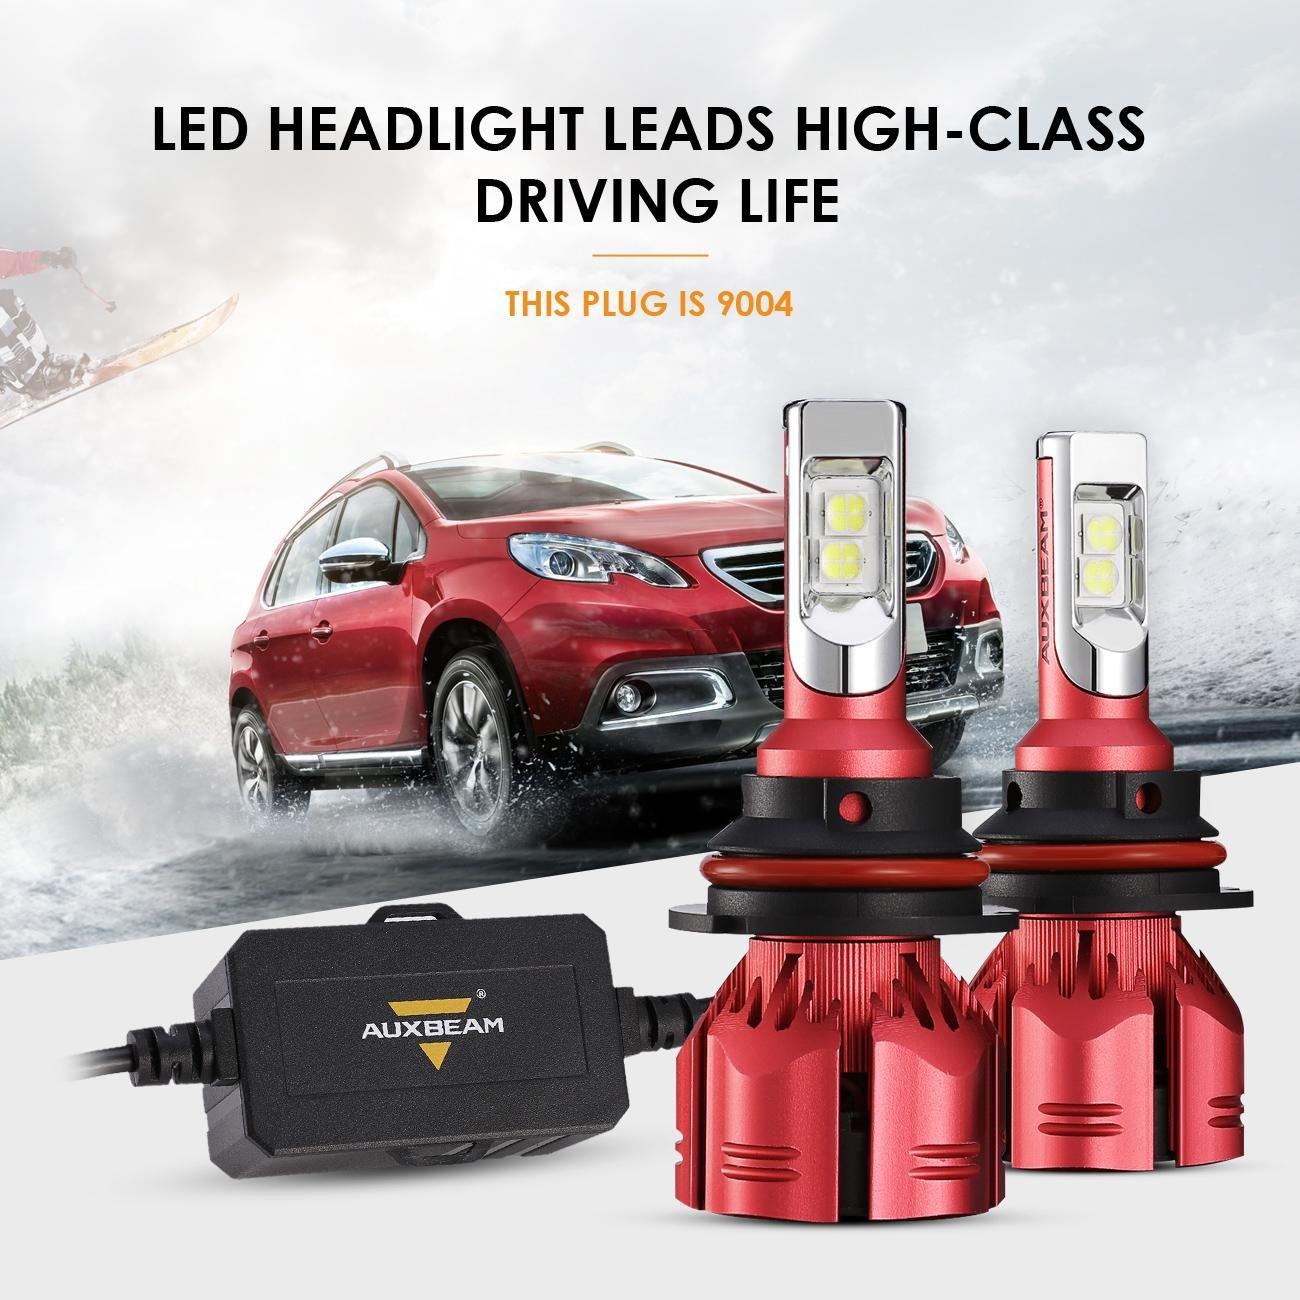 Auxbeam LED Headlight Bulbs NF-S1 Series LED Headlights with 2 Pcs of 9005 HB3 H10 9145 LED Philips CSP LED Headlight Conversion Kit 50W 8000lm 6000K Single Beam - 1 Year Warranty